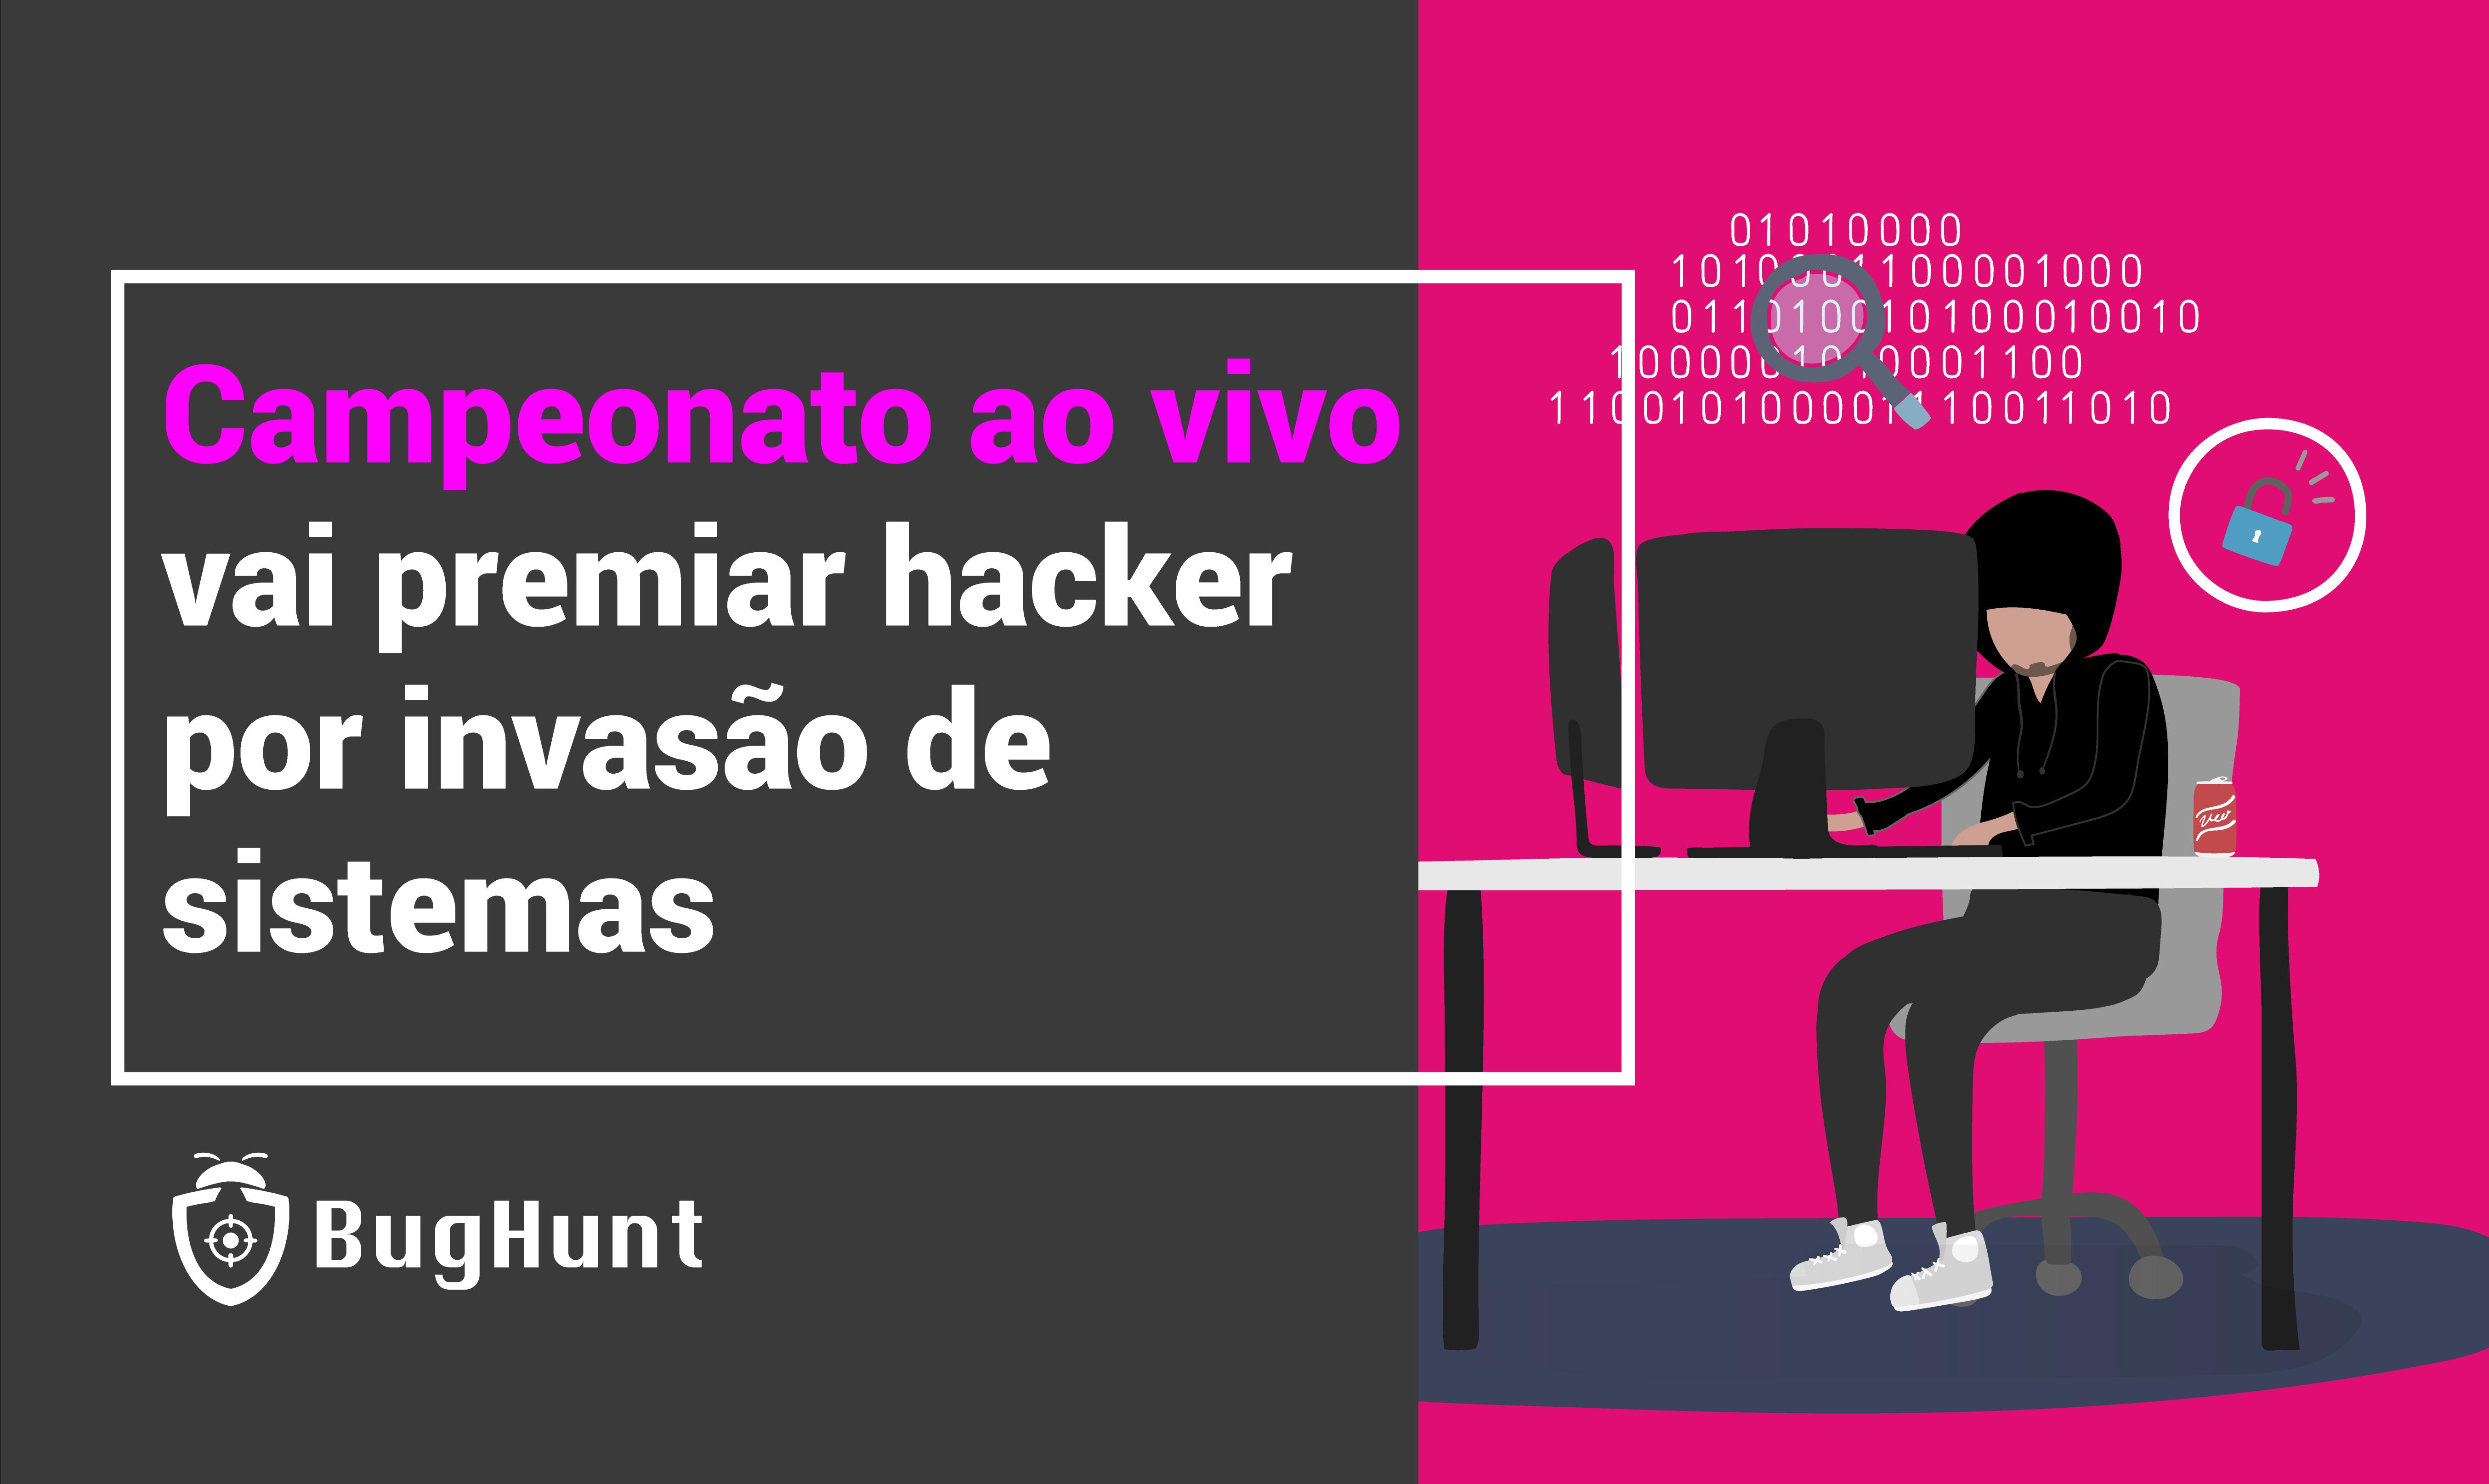 Campeonato ao vivo vai premiar hackers por invasão de sistemas